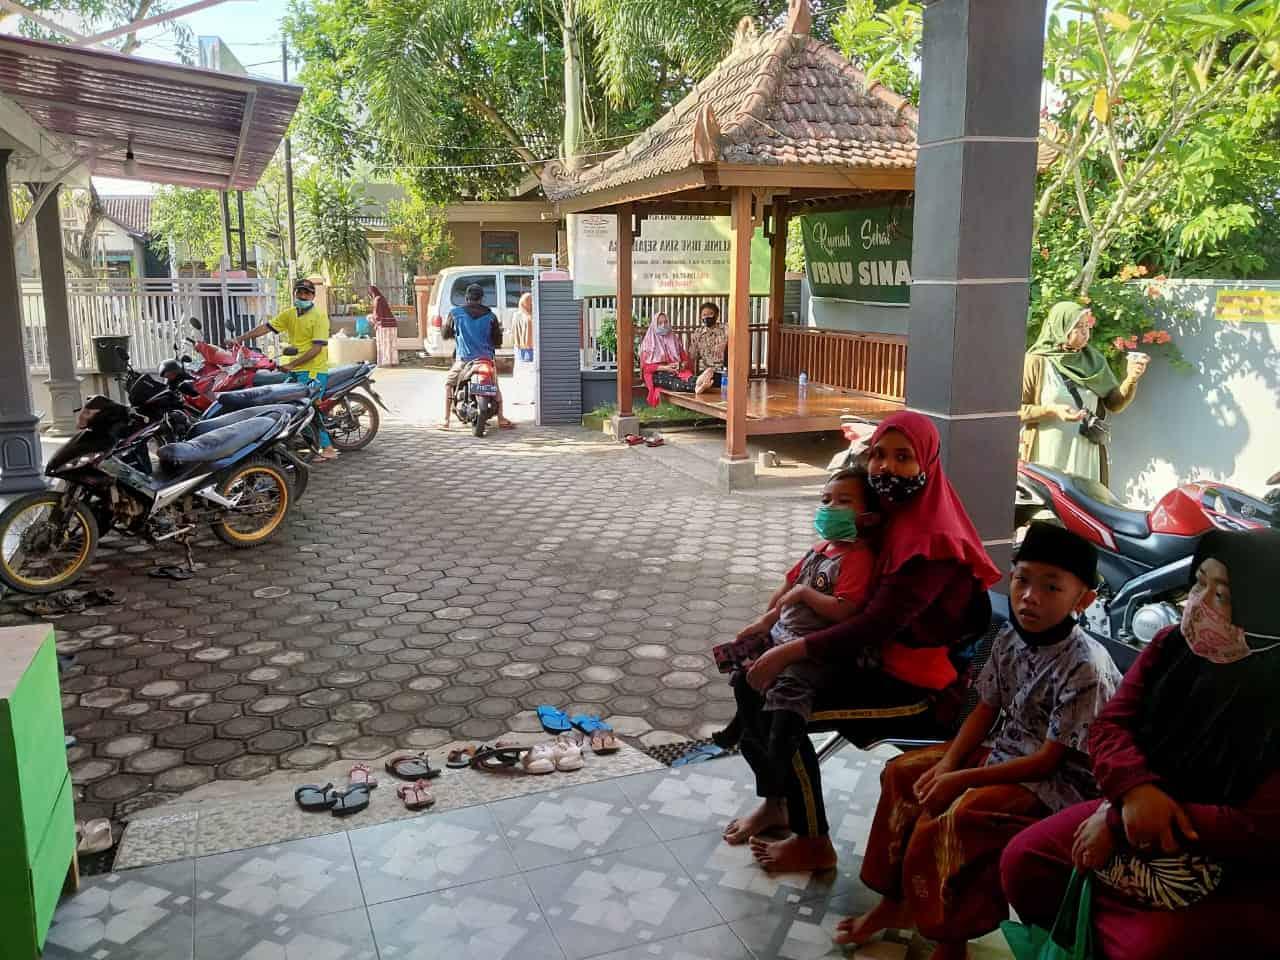 0853-3553-3563 Sunat Jember Anak-7524-IbnuSinaJember (29)